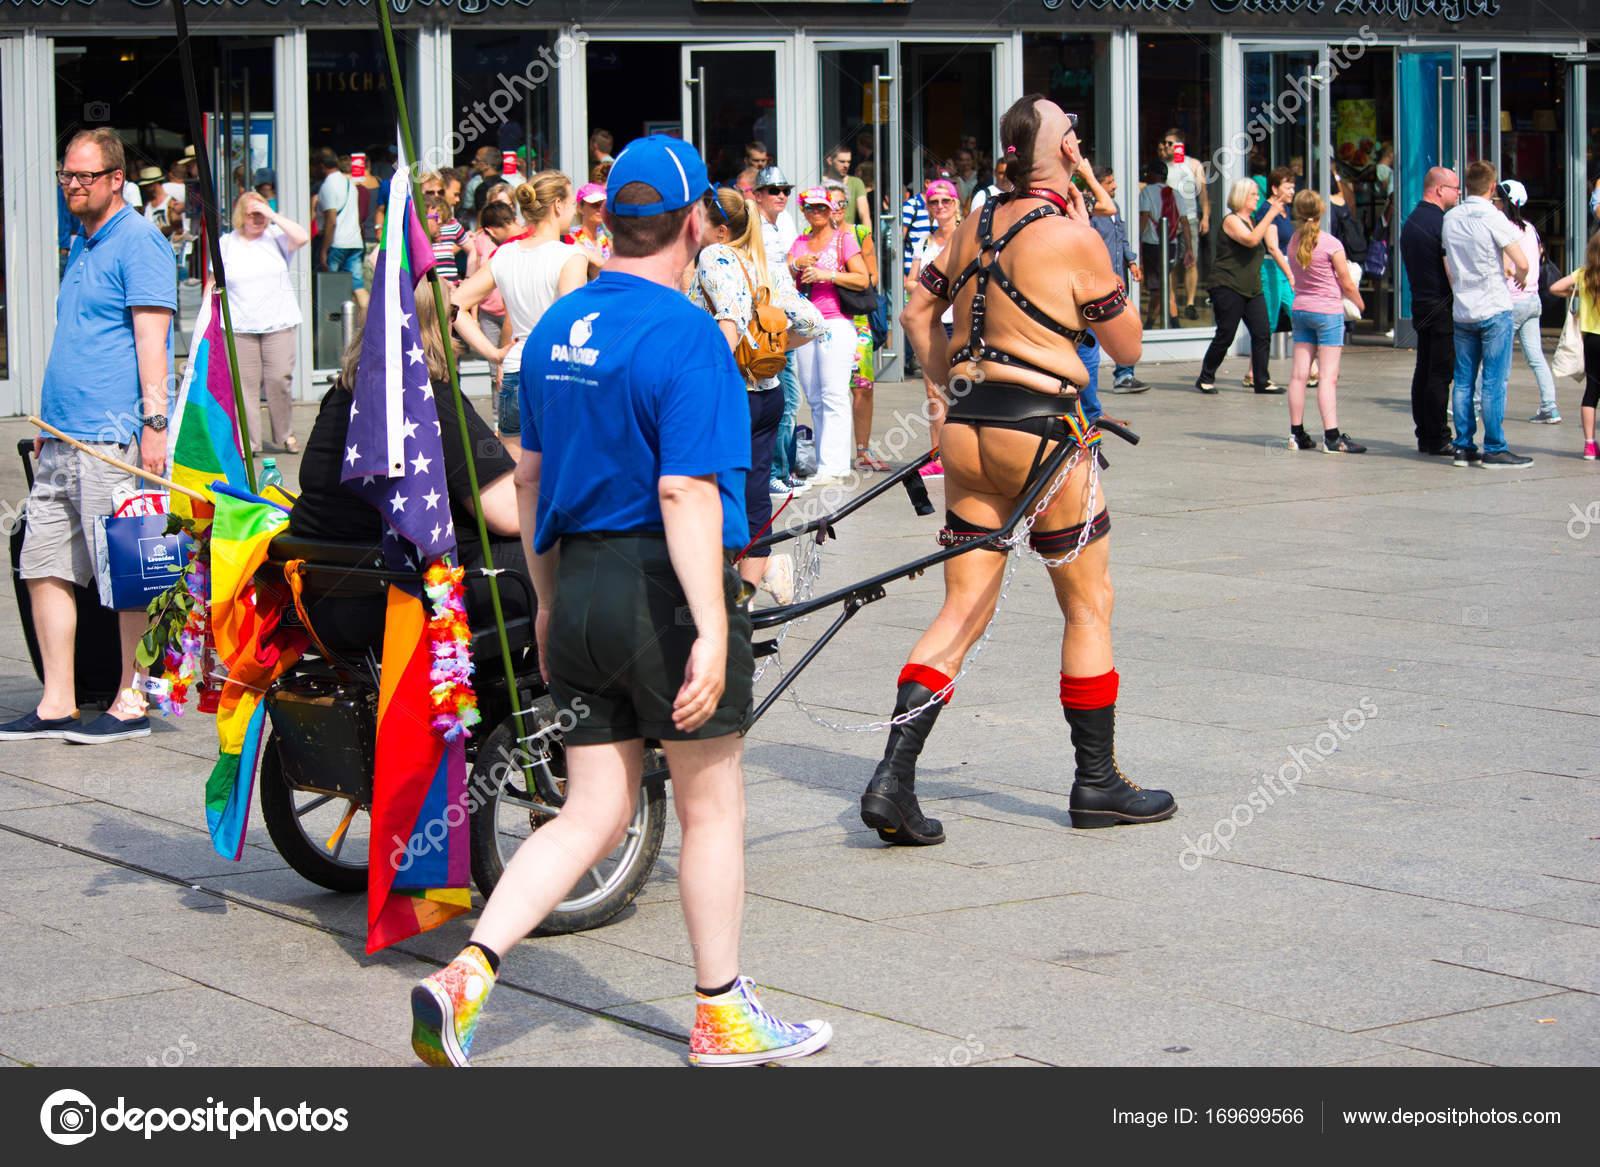 gay bareback escorts